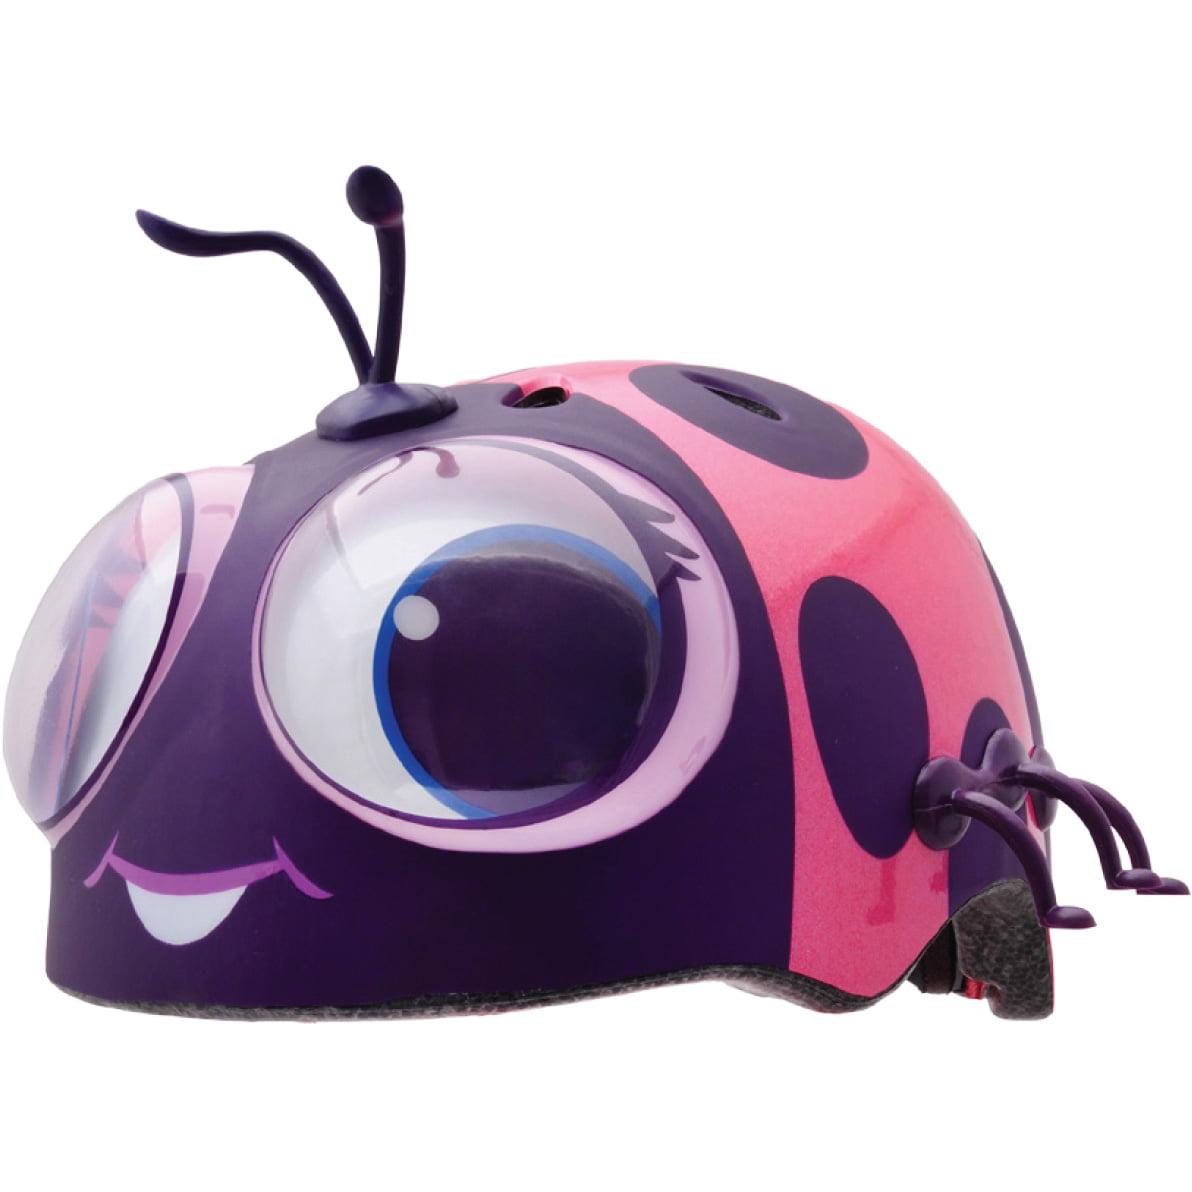 Raskullz Googly Lady Bug Toddler Bike Helmet, Pink